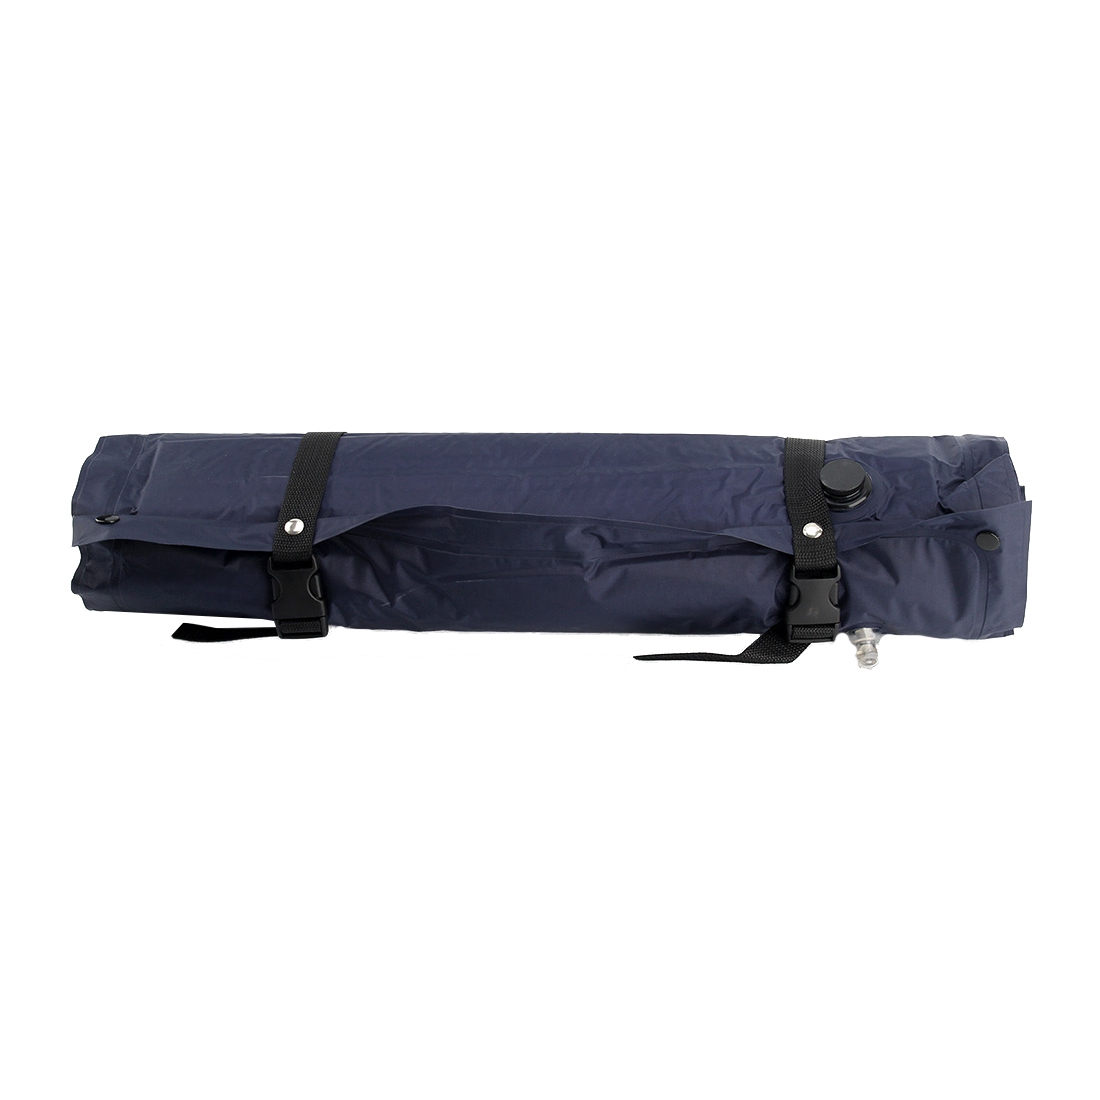 Single Self Inflating Camping Roll Mat/Pad Inflatable <font><b>Bed</b></font> Sleeping Mattress + Bag